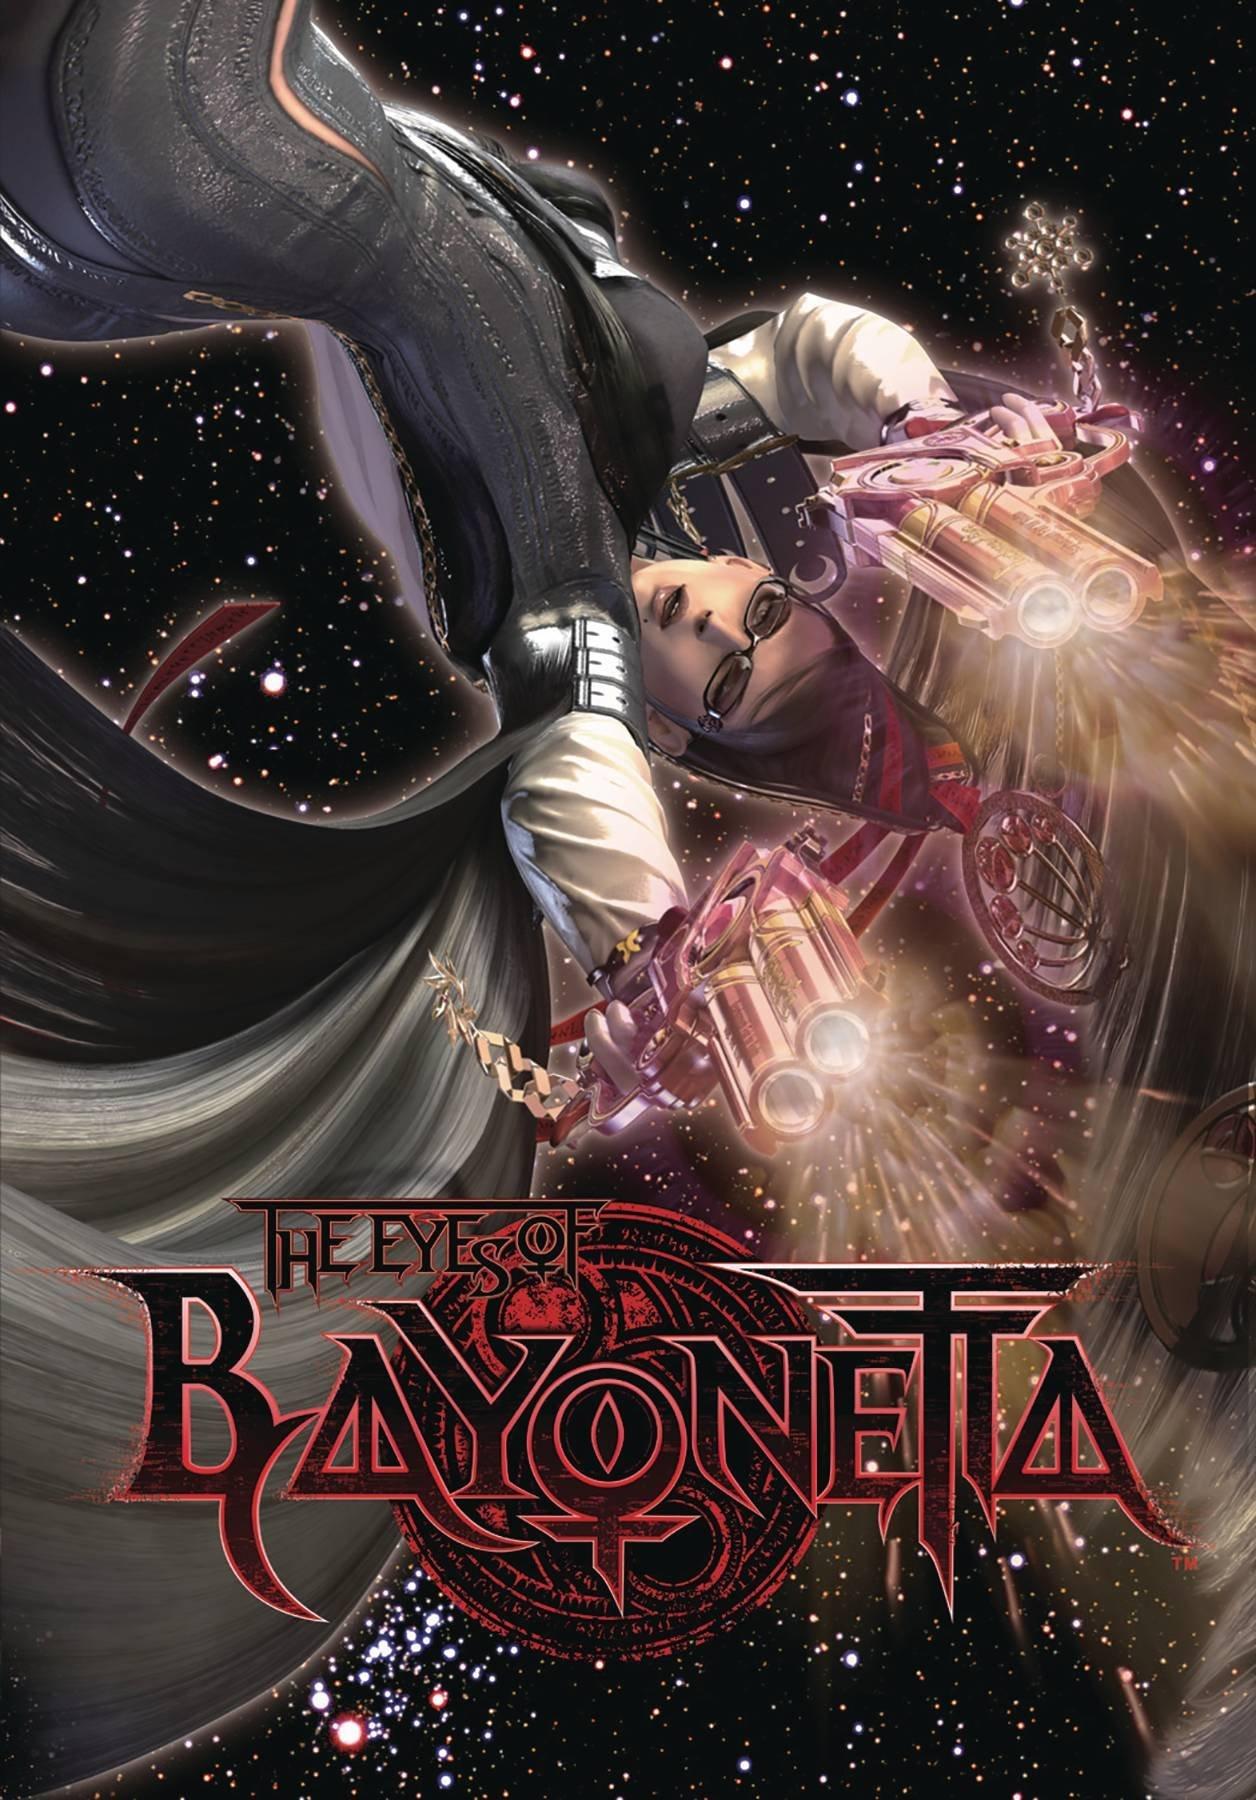 Bayonetta - The Eyes of Bayonetta